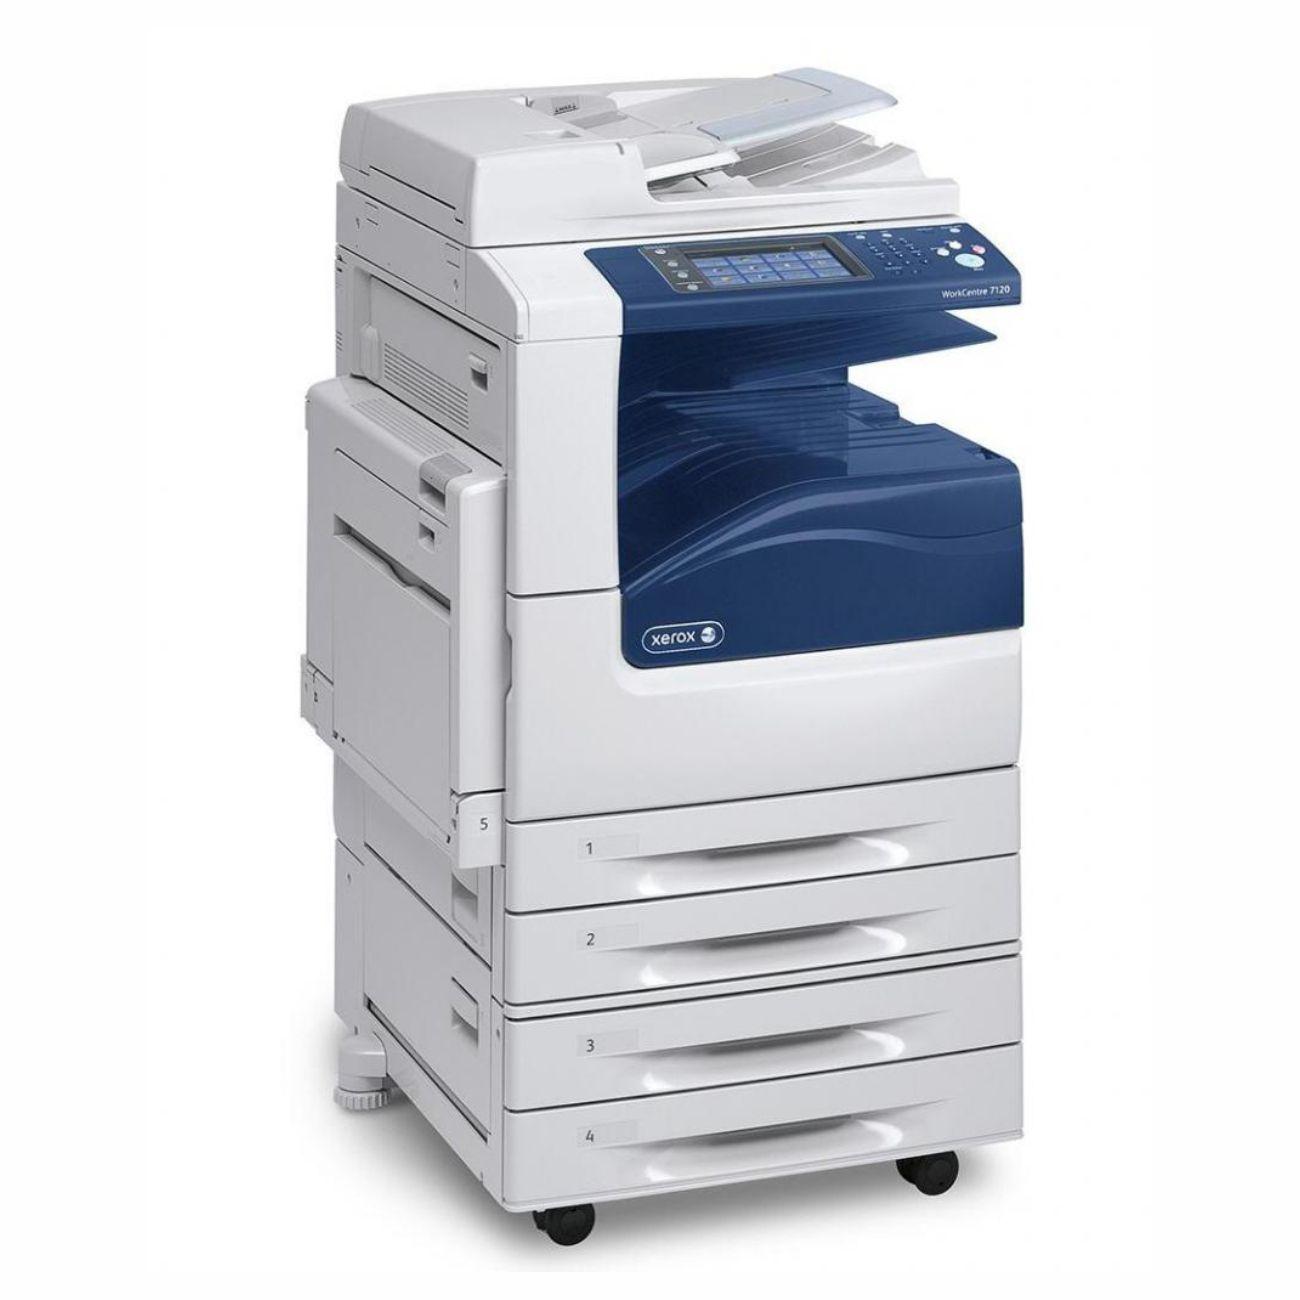 Impressora Multifuncional Monocromática Xerox Workcentre 5955 Seminova